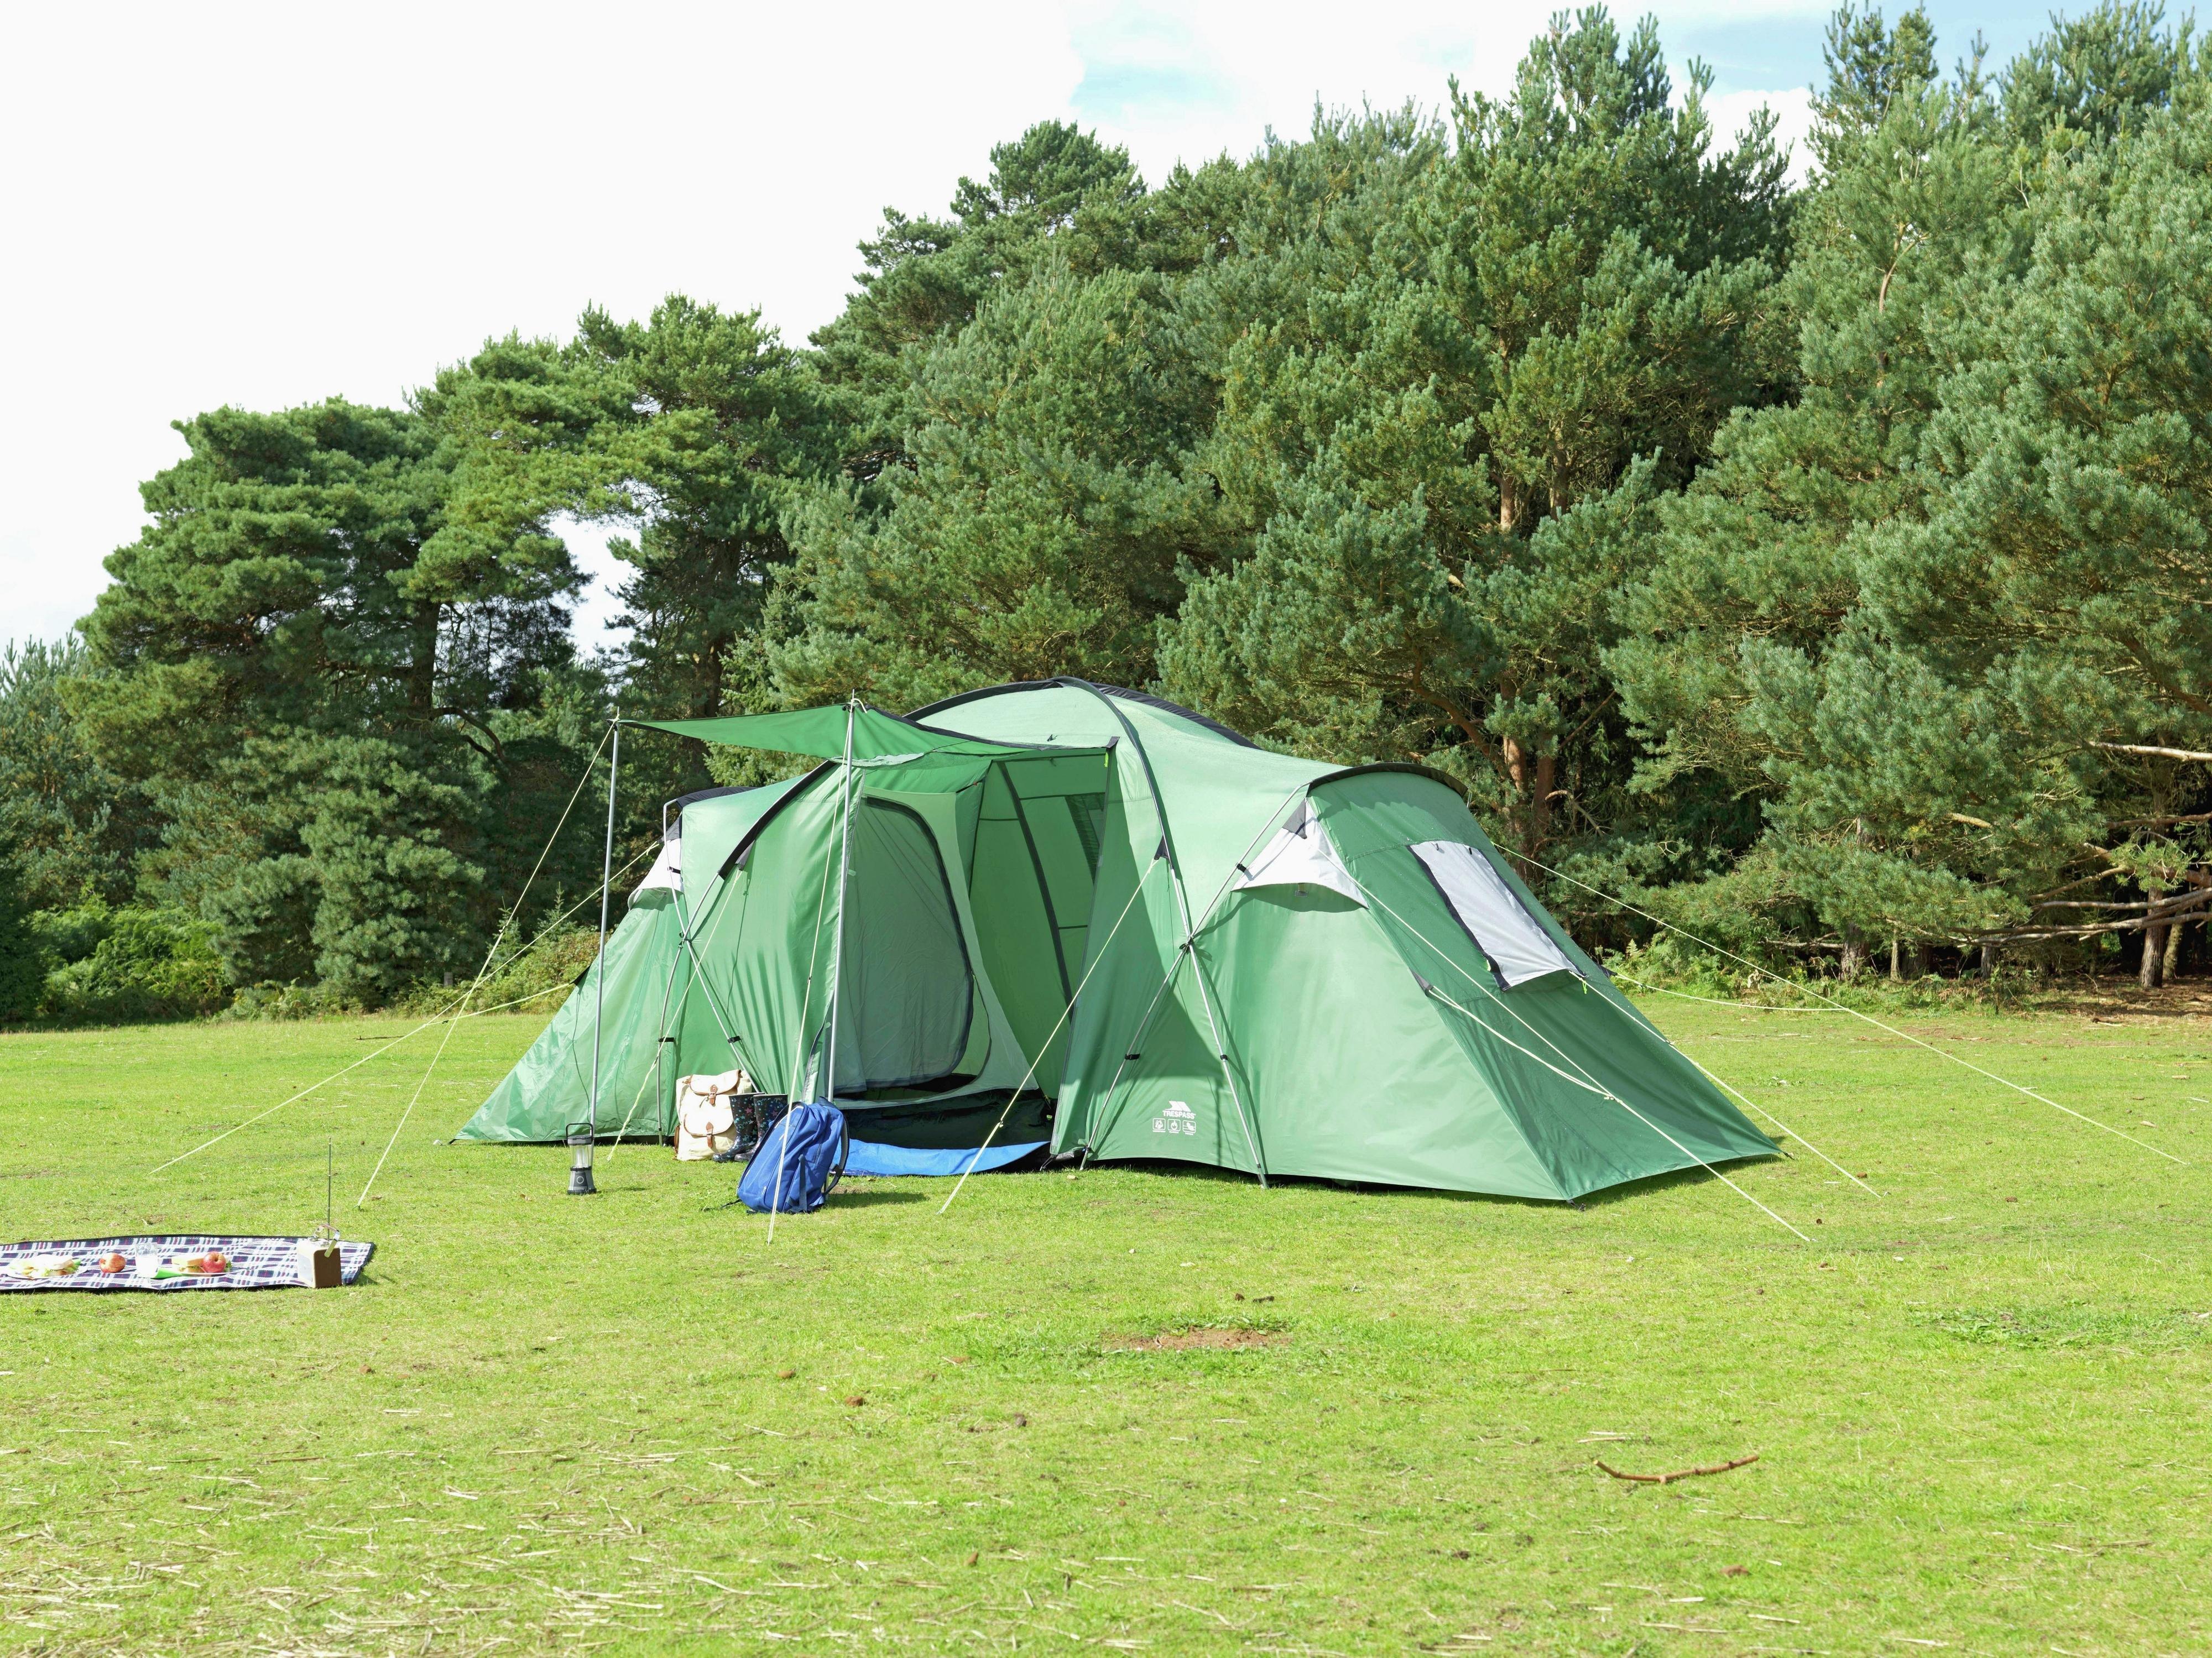 ... 2 Room Tent If Pro Action 6 Person. Argos On  sc 1 st  Best Tent 2018 & Argos 4 Man Pop Up Tent - Best Tent 2018